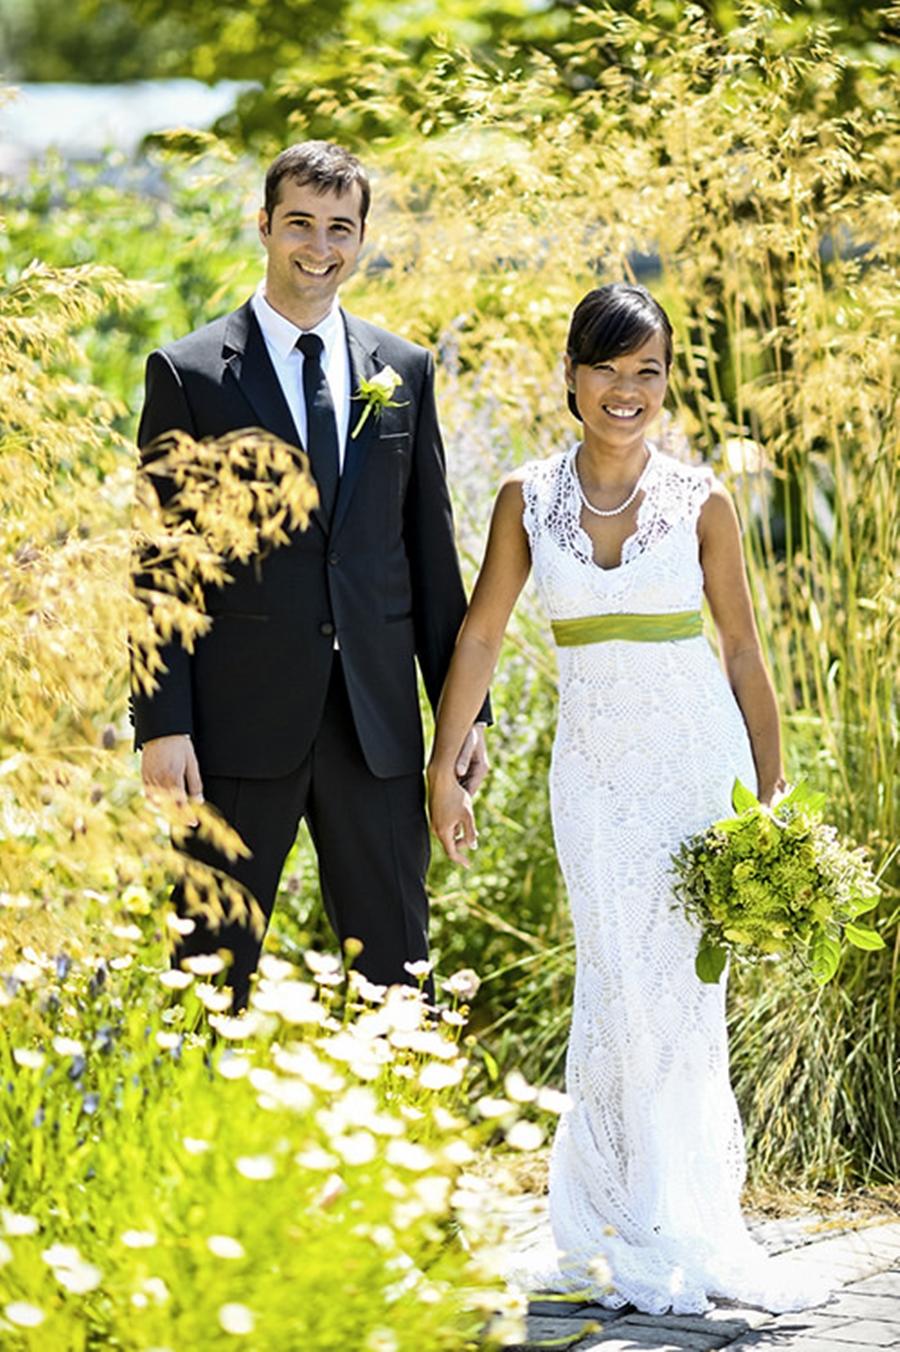 Vestido de casamento de crochê